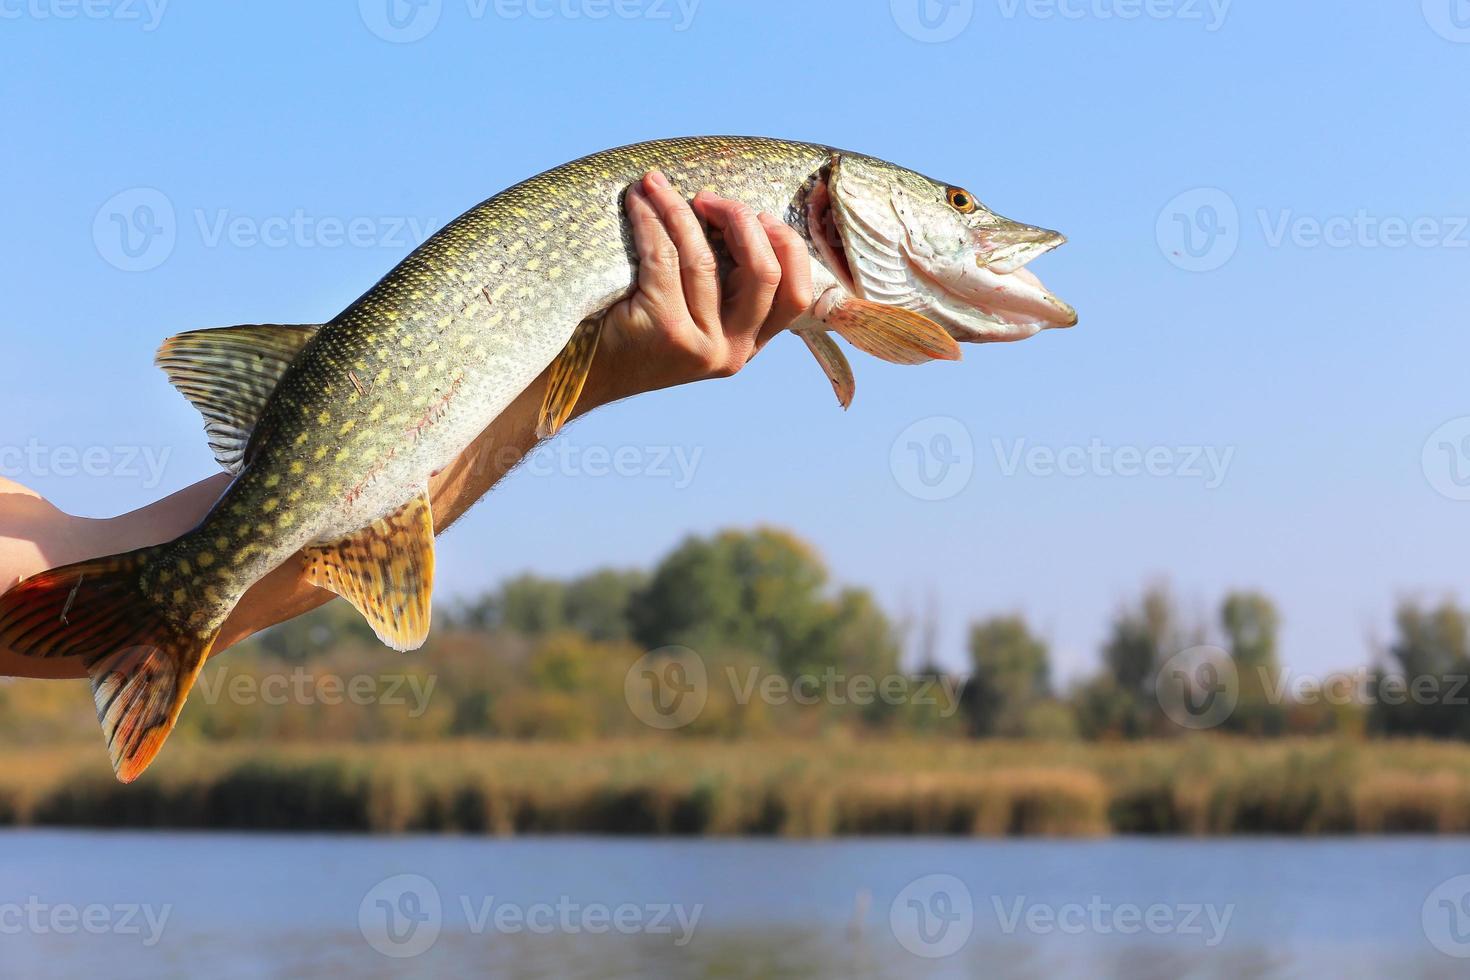 visvangst foto